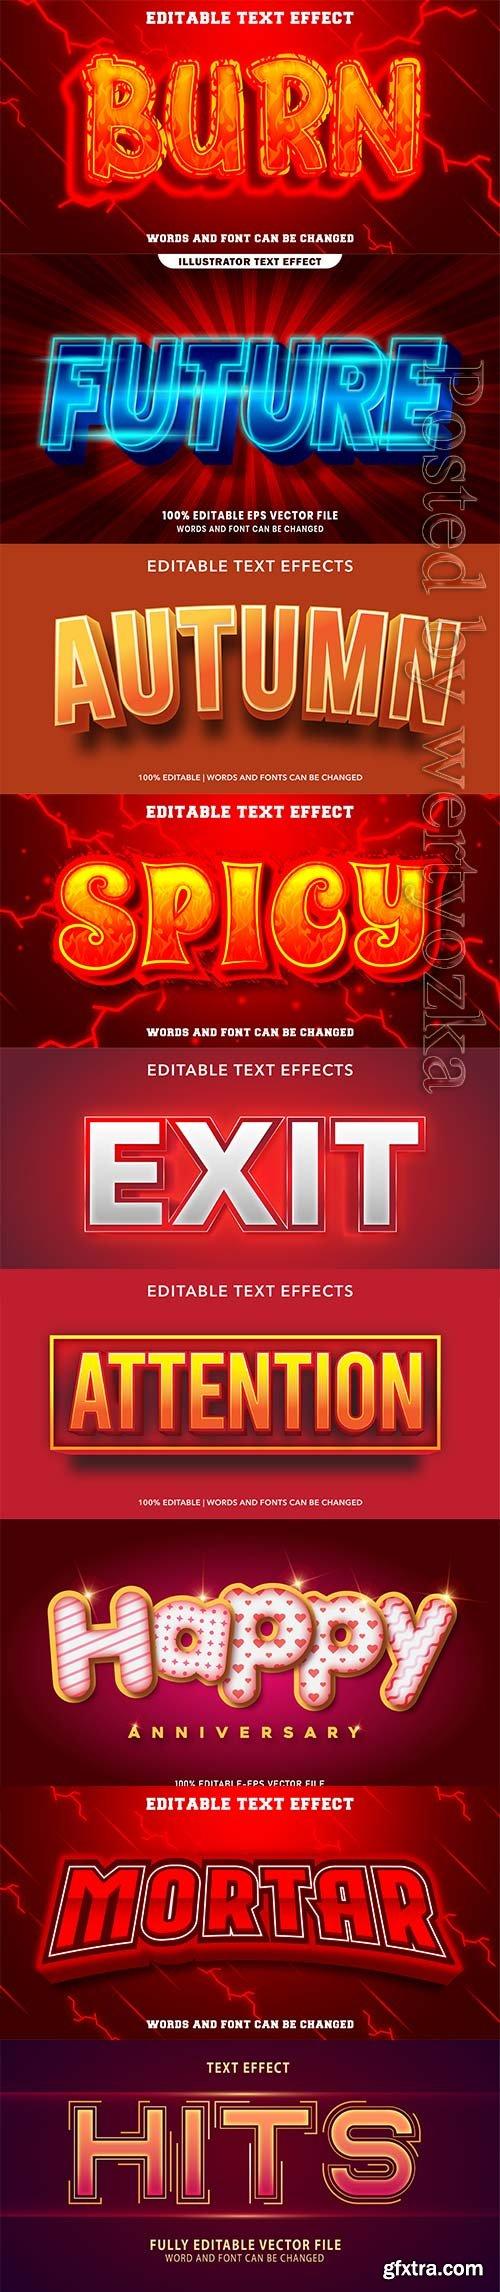 3d editable text style effect vector vol 246